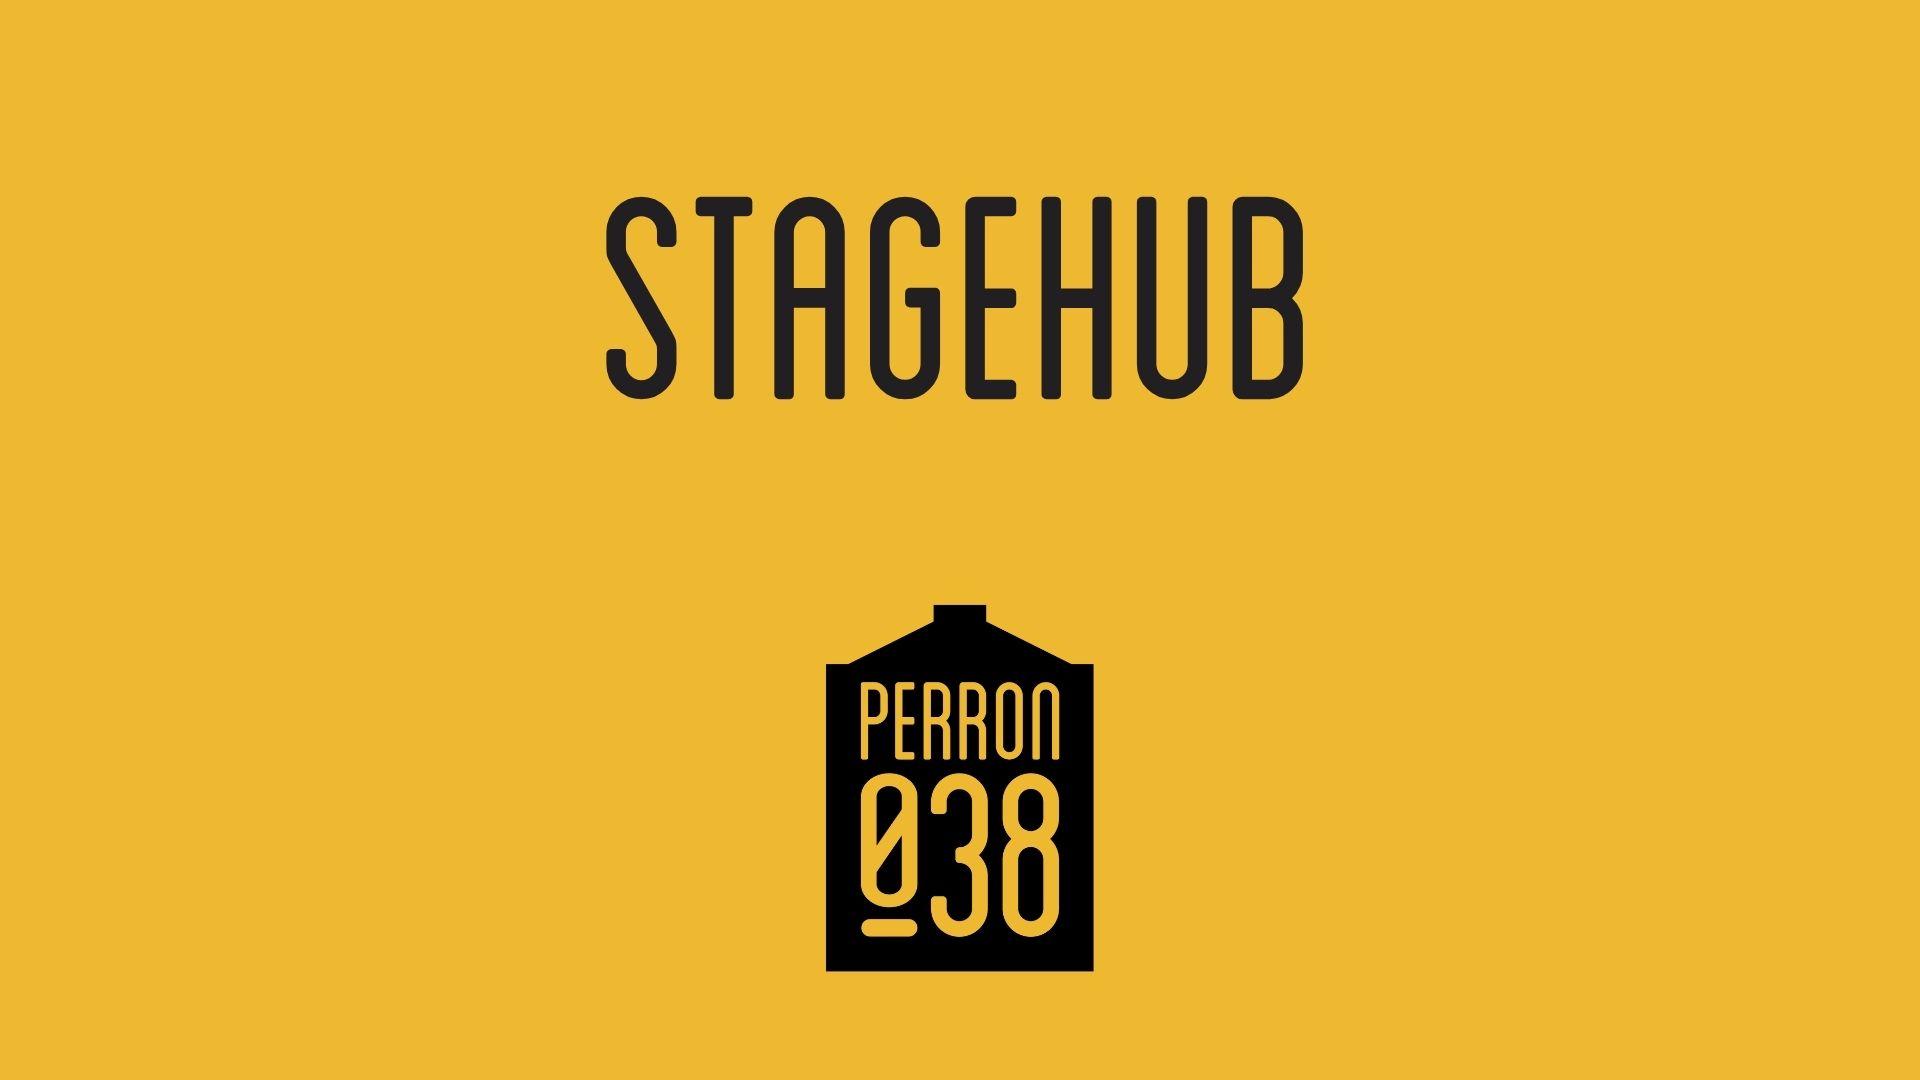 Stagehub event